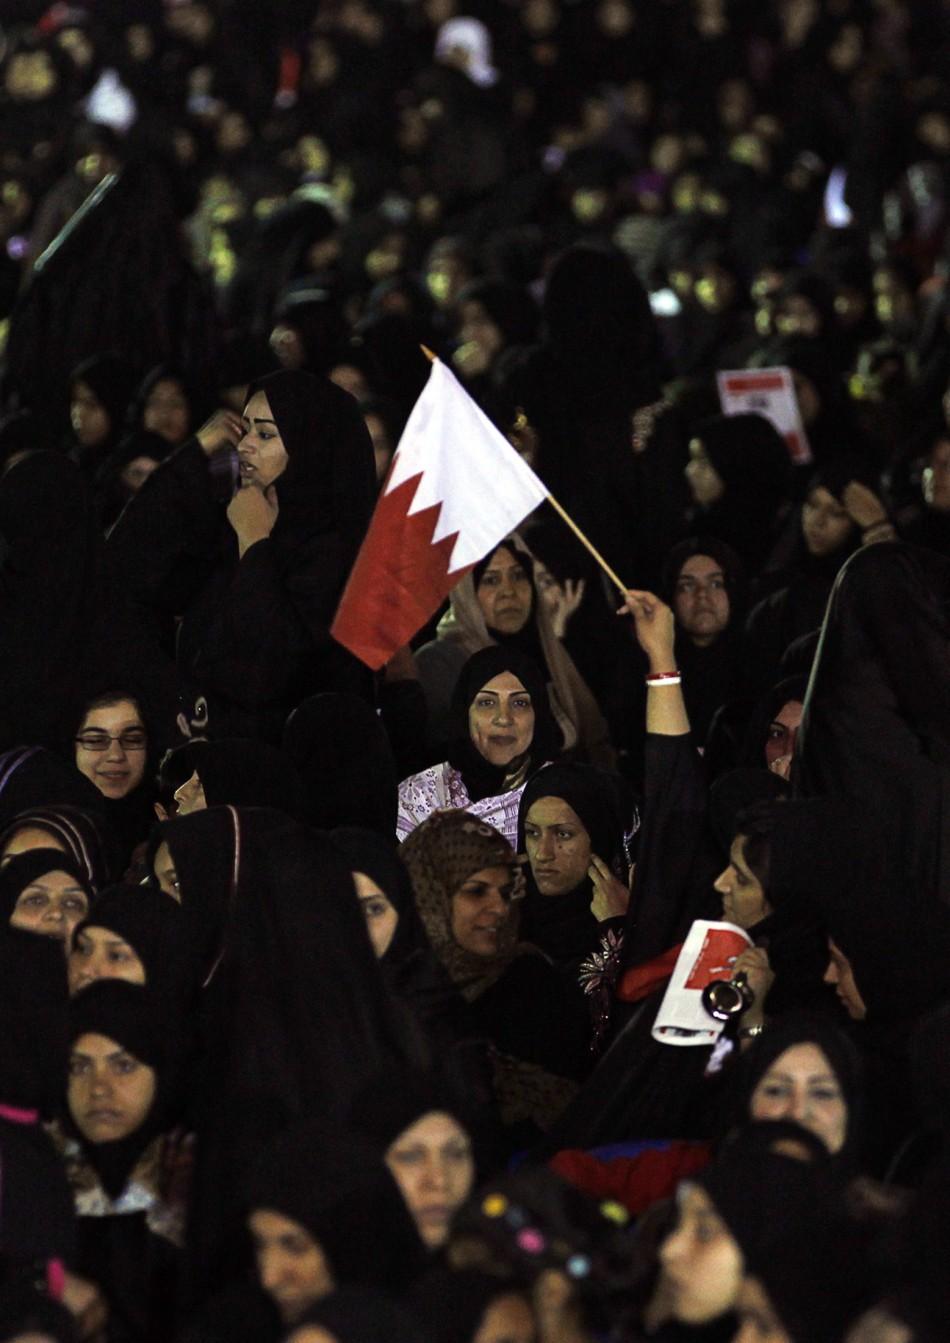 Anti-government protesters in Bahrain